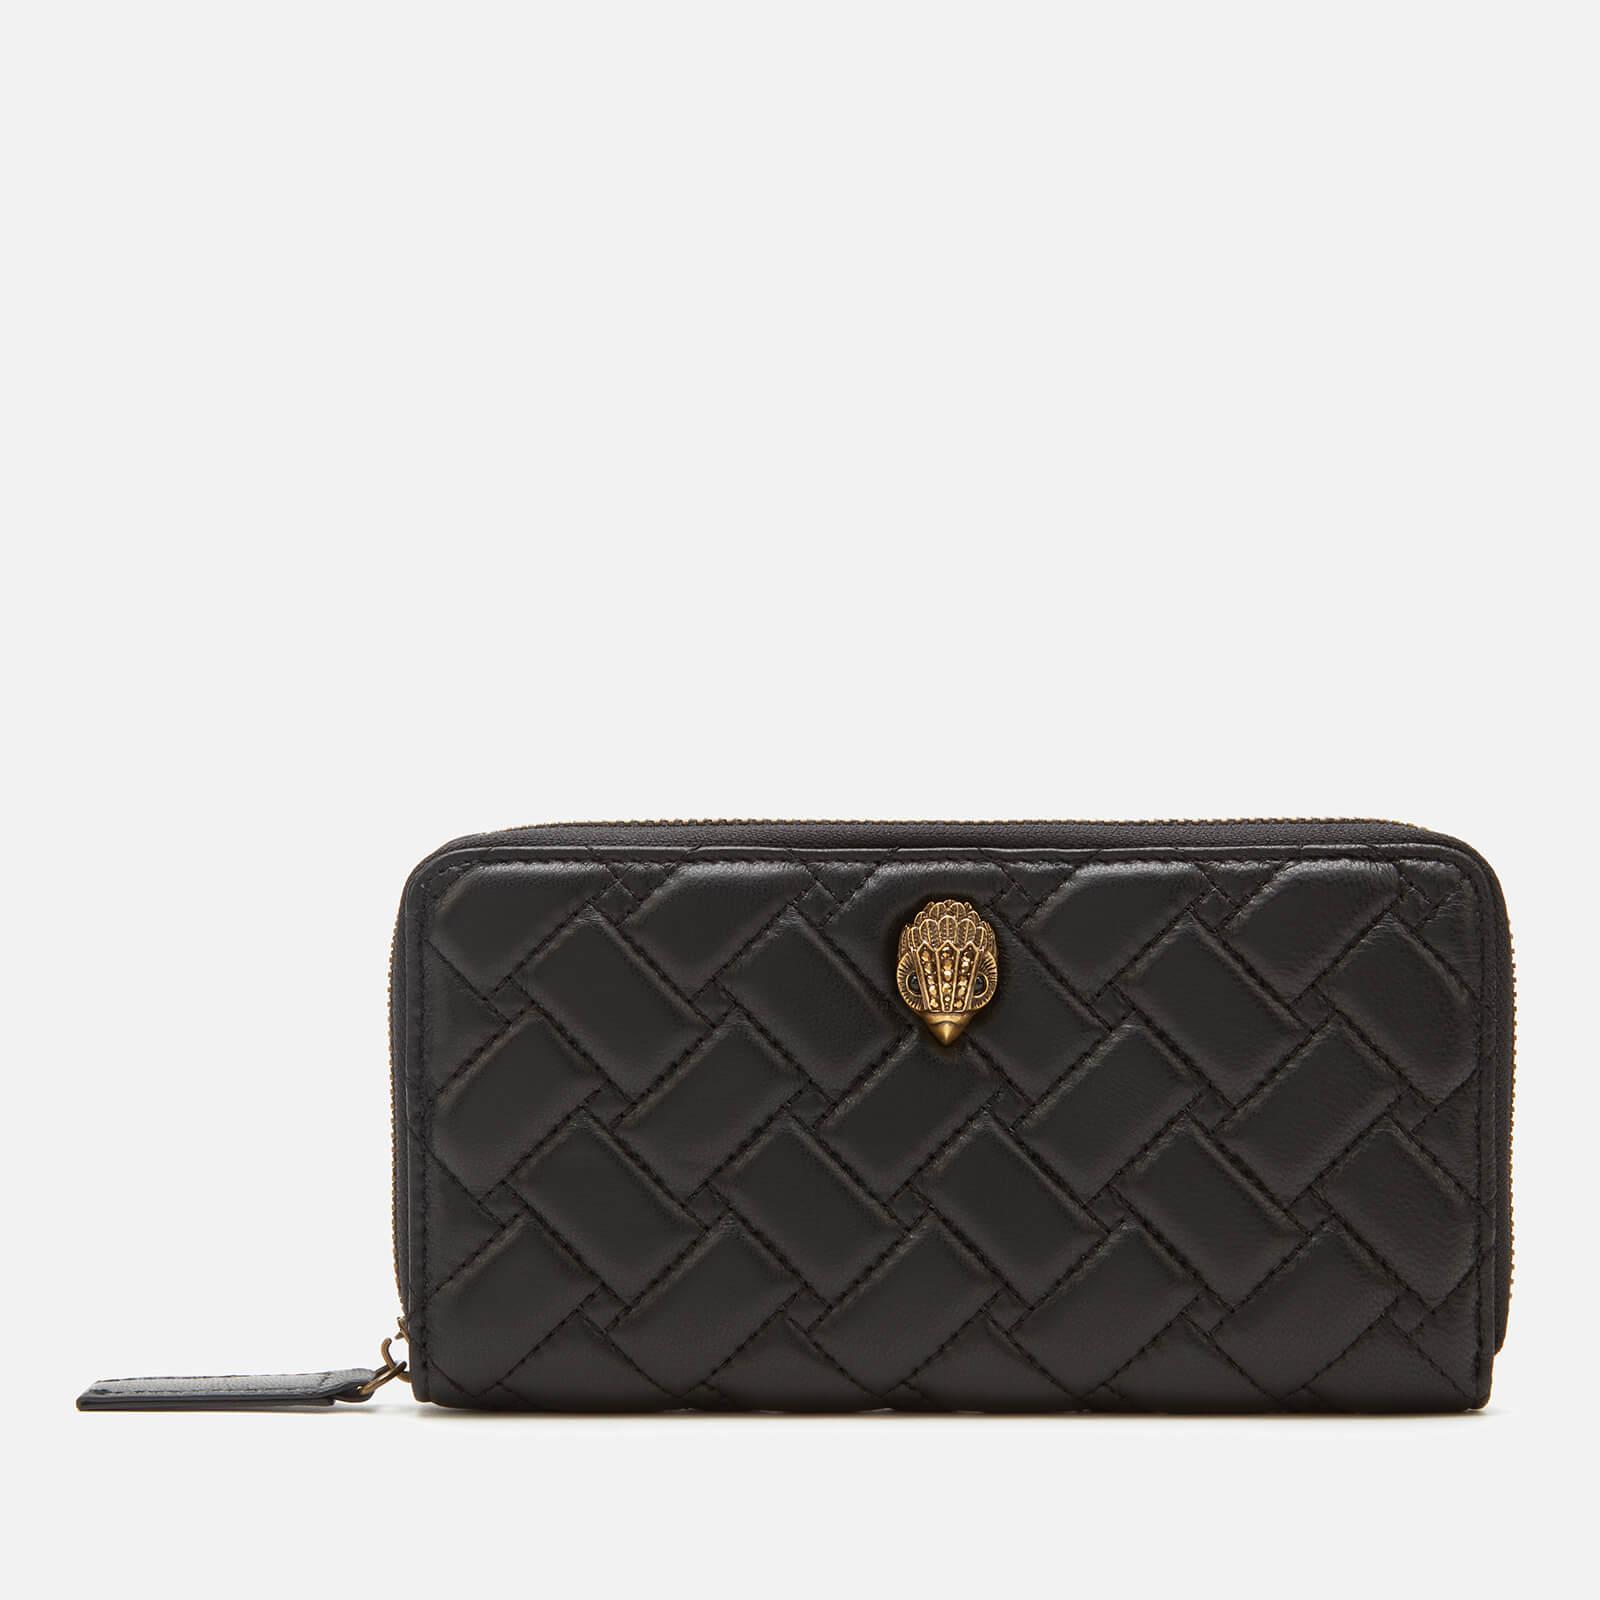 Kurt Geiger London Women's Kensington Zip Around Wallet - Black